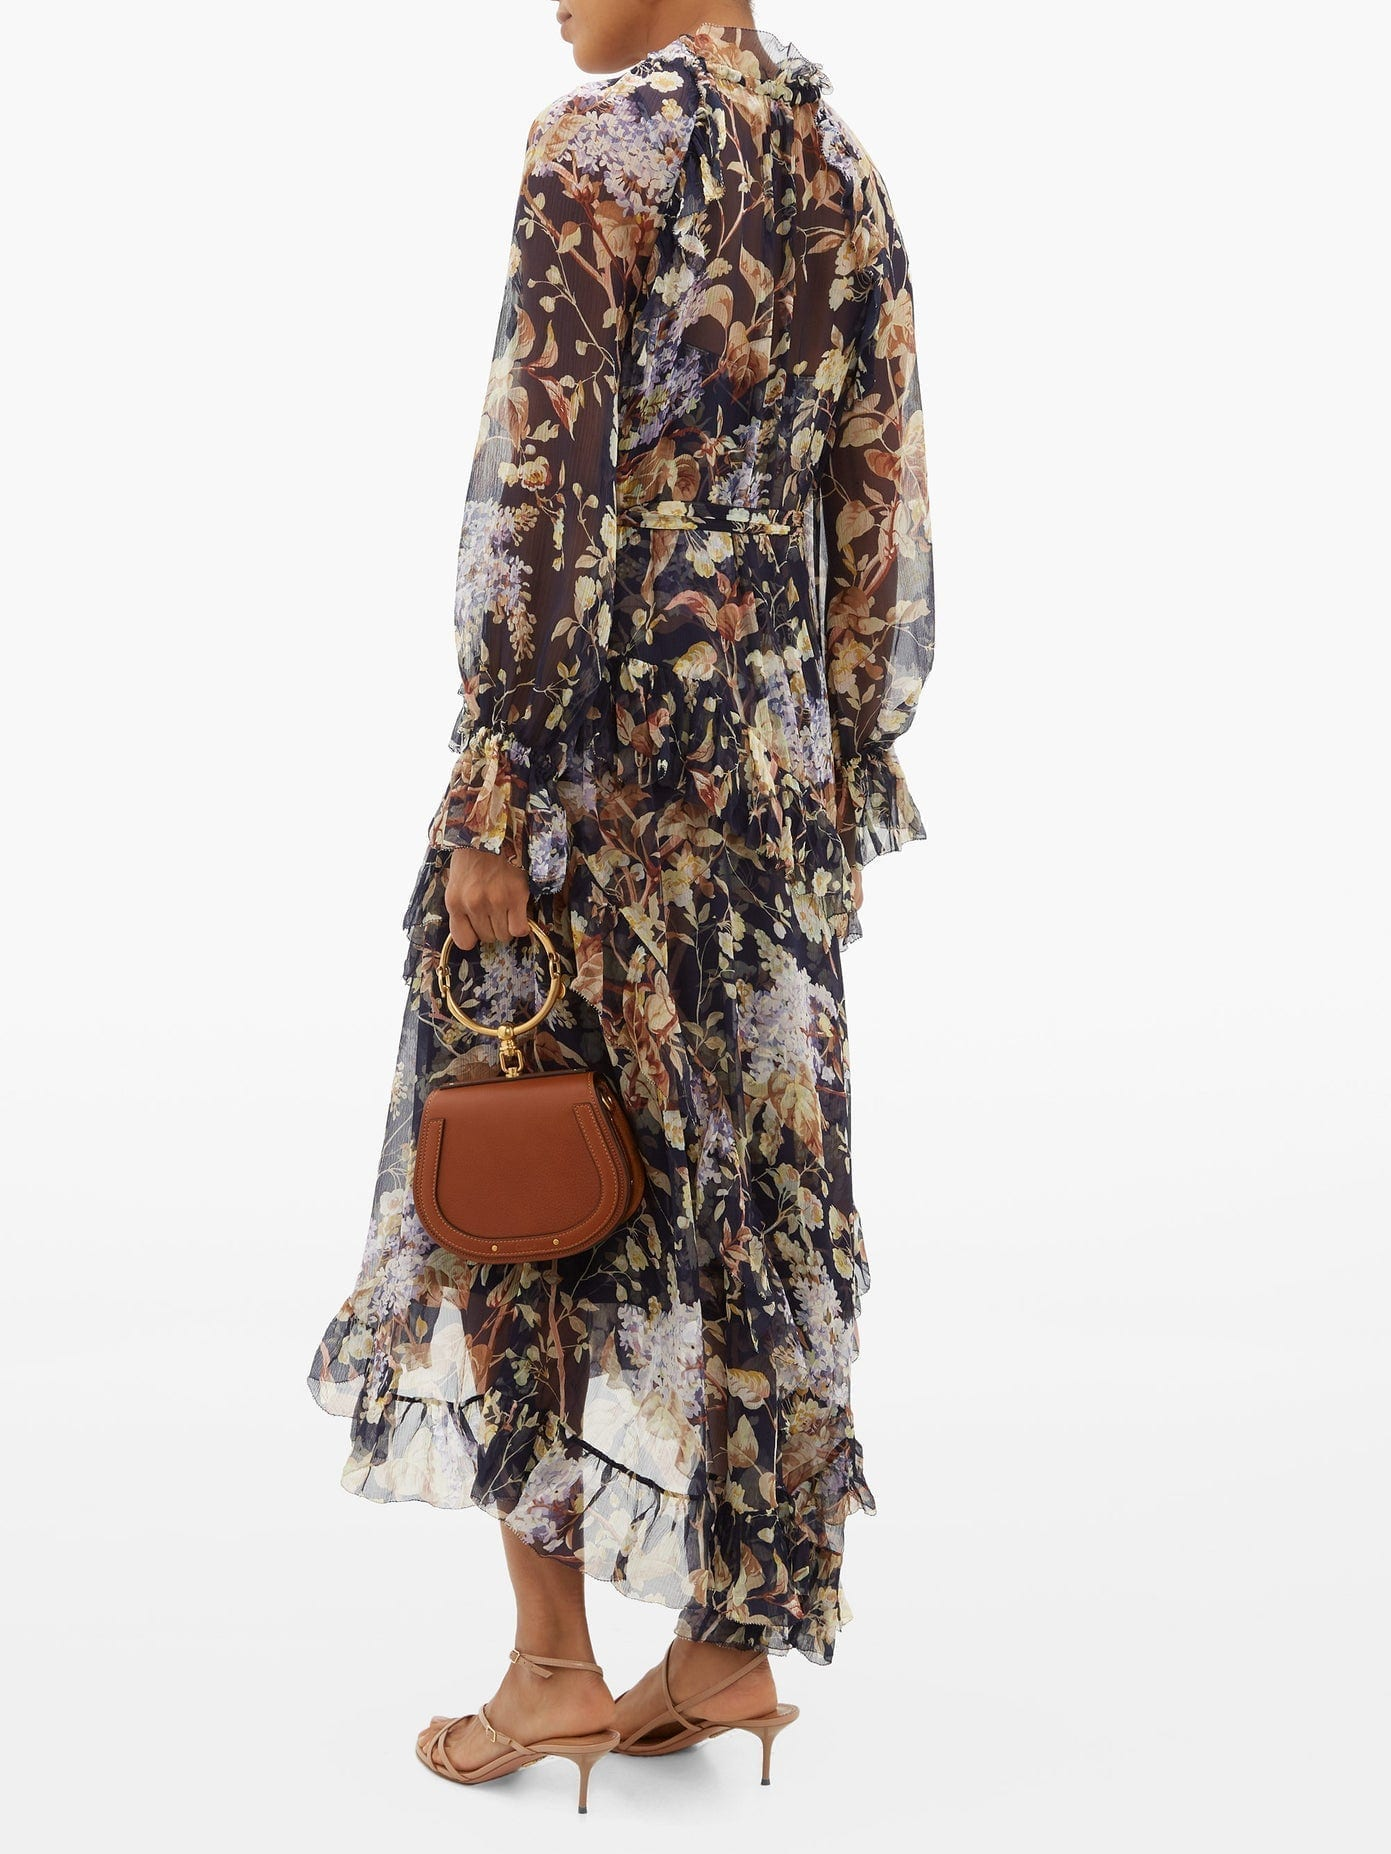 Zimmermann Sabotage Floral Print Silk Chiffon Midi Dress